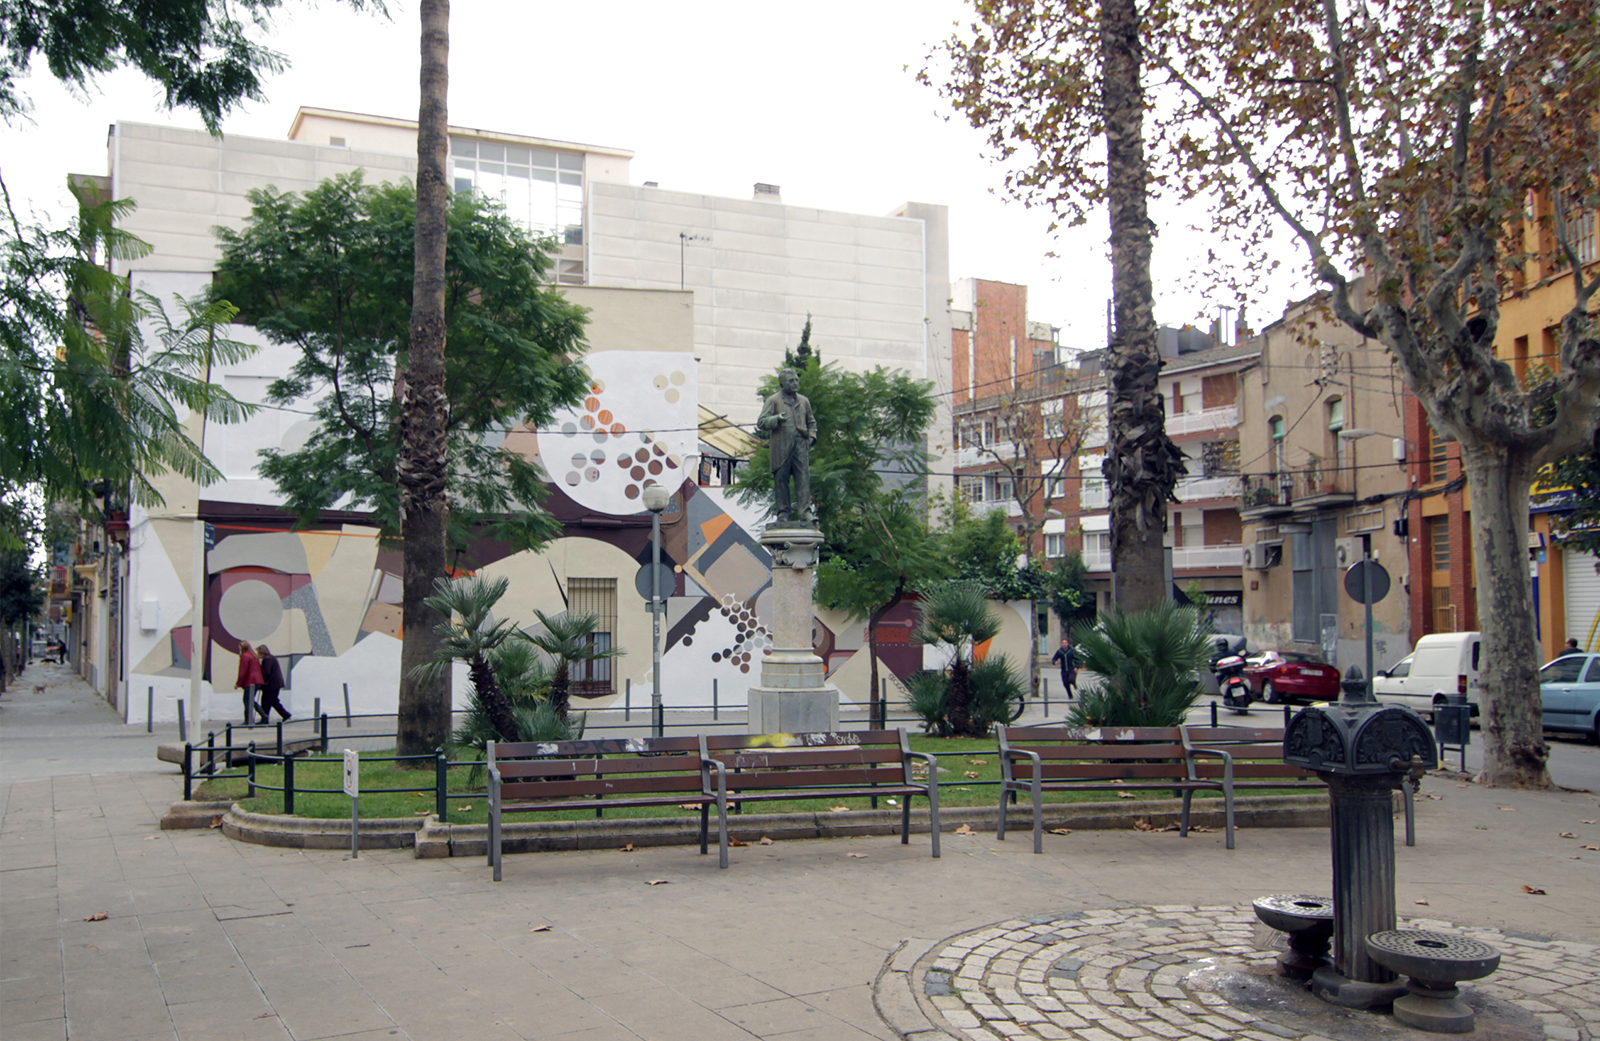 spogo-new-mural-for-openwalls-barcelona-08